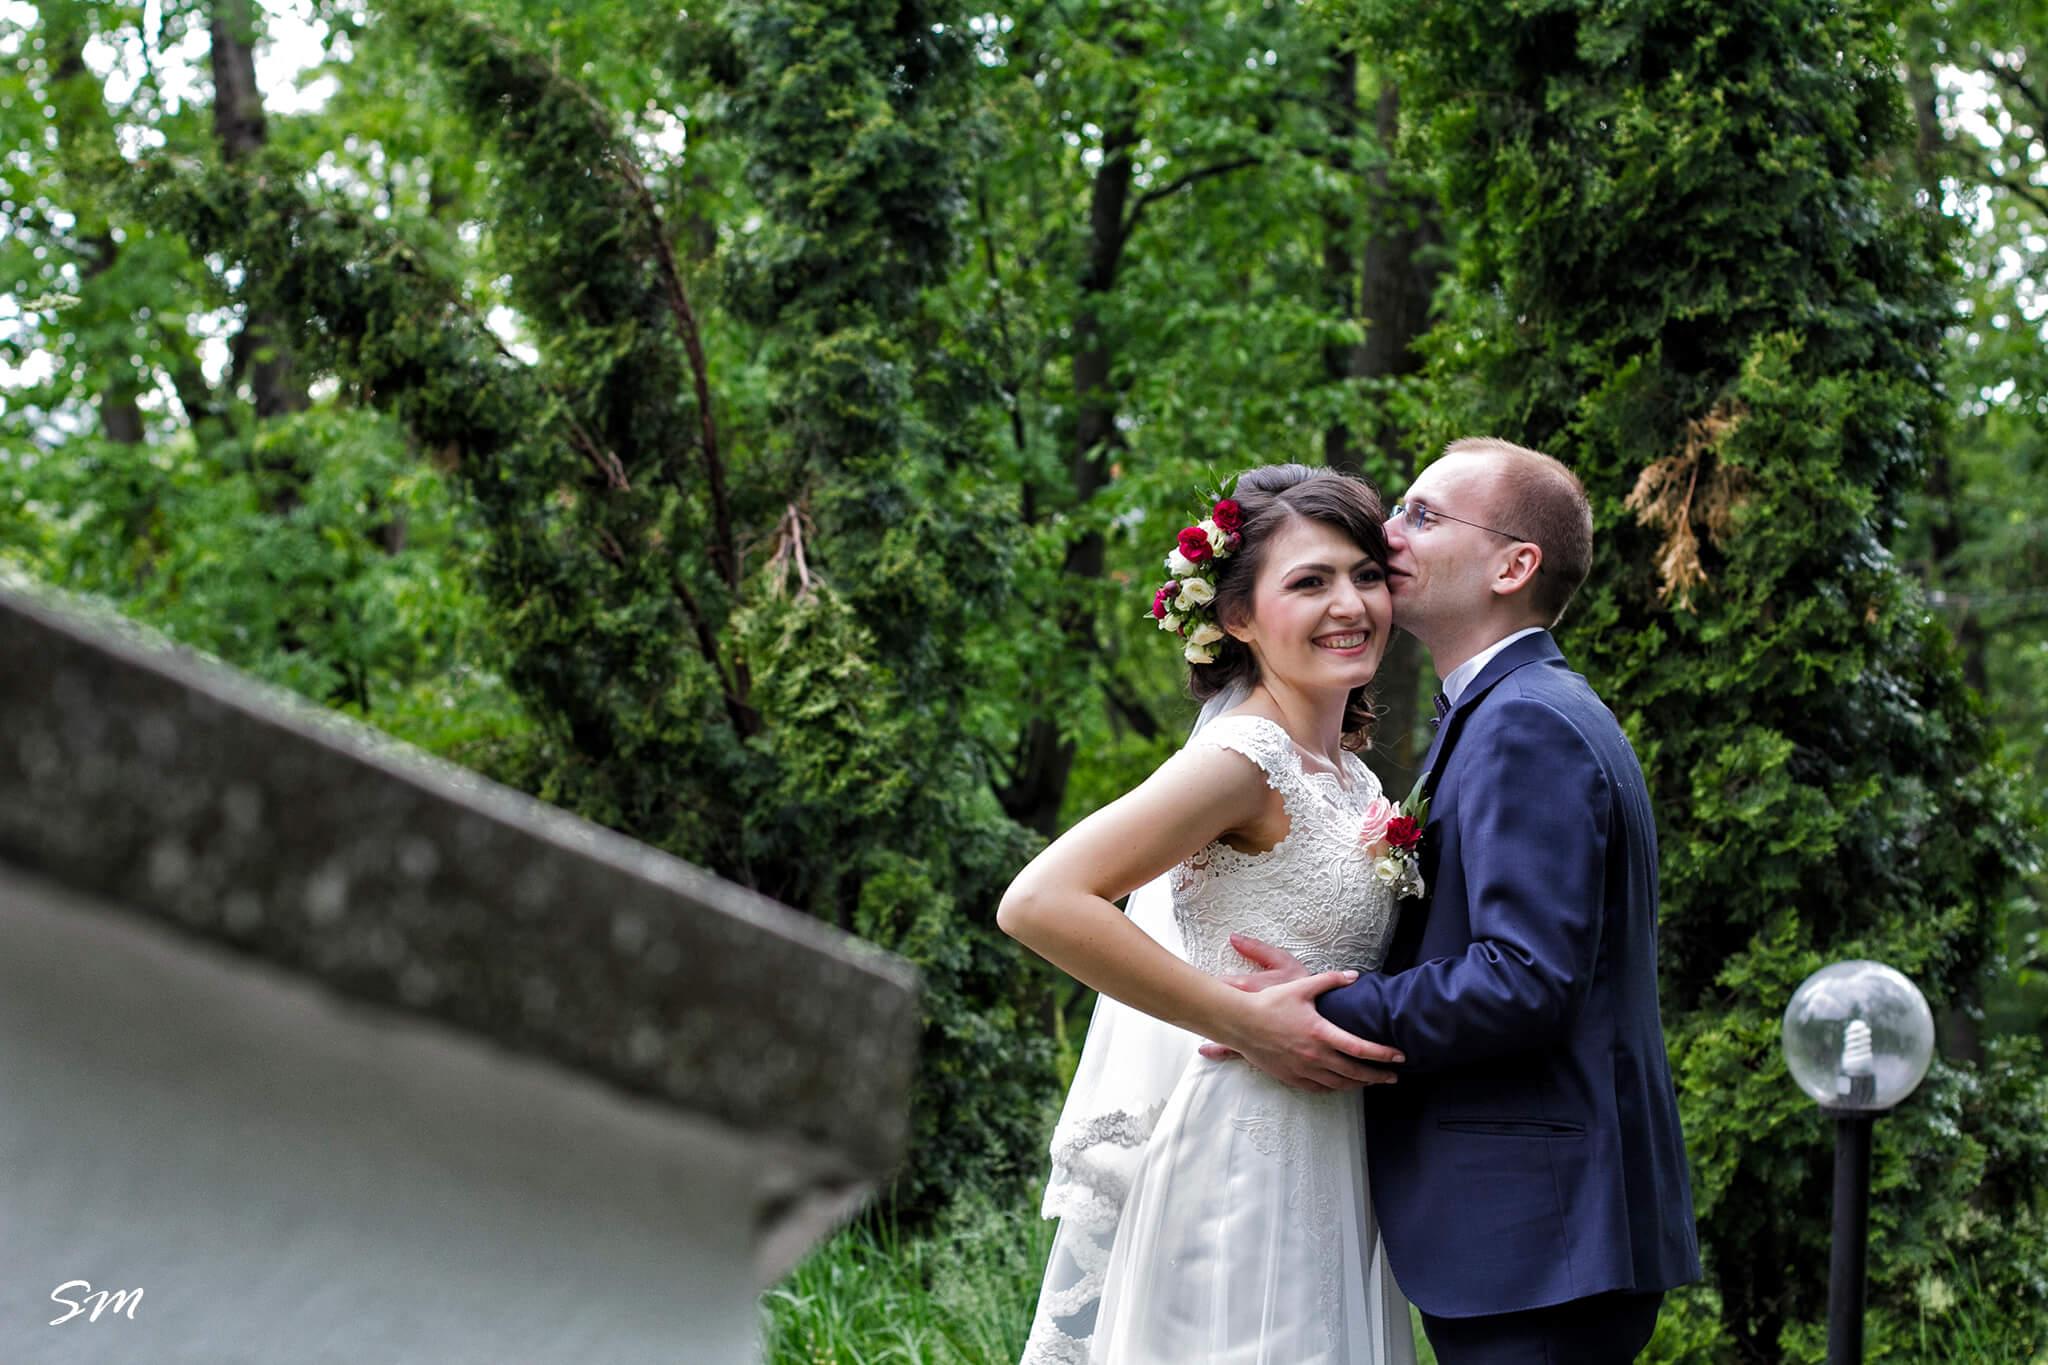 fotograf_nunta_profesionist_suceava (17)